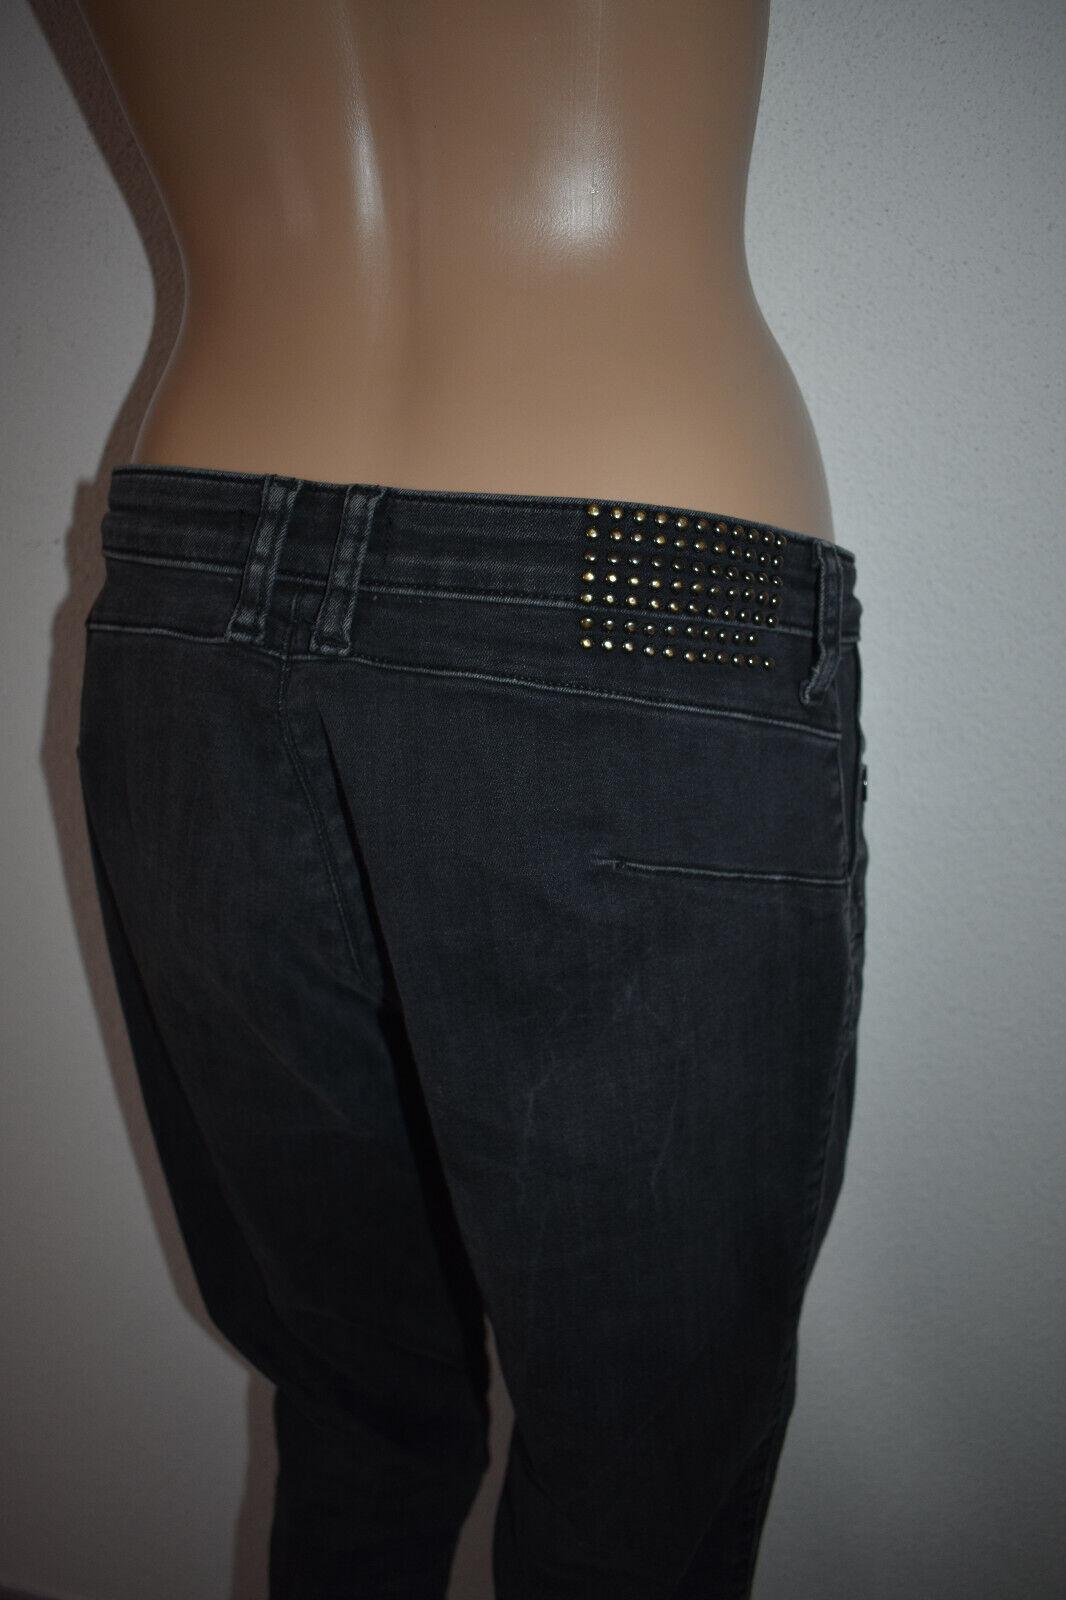 Guess femme jean curve & chino skinny denim gris 38-s / 31x30